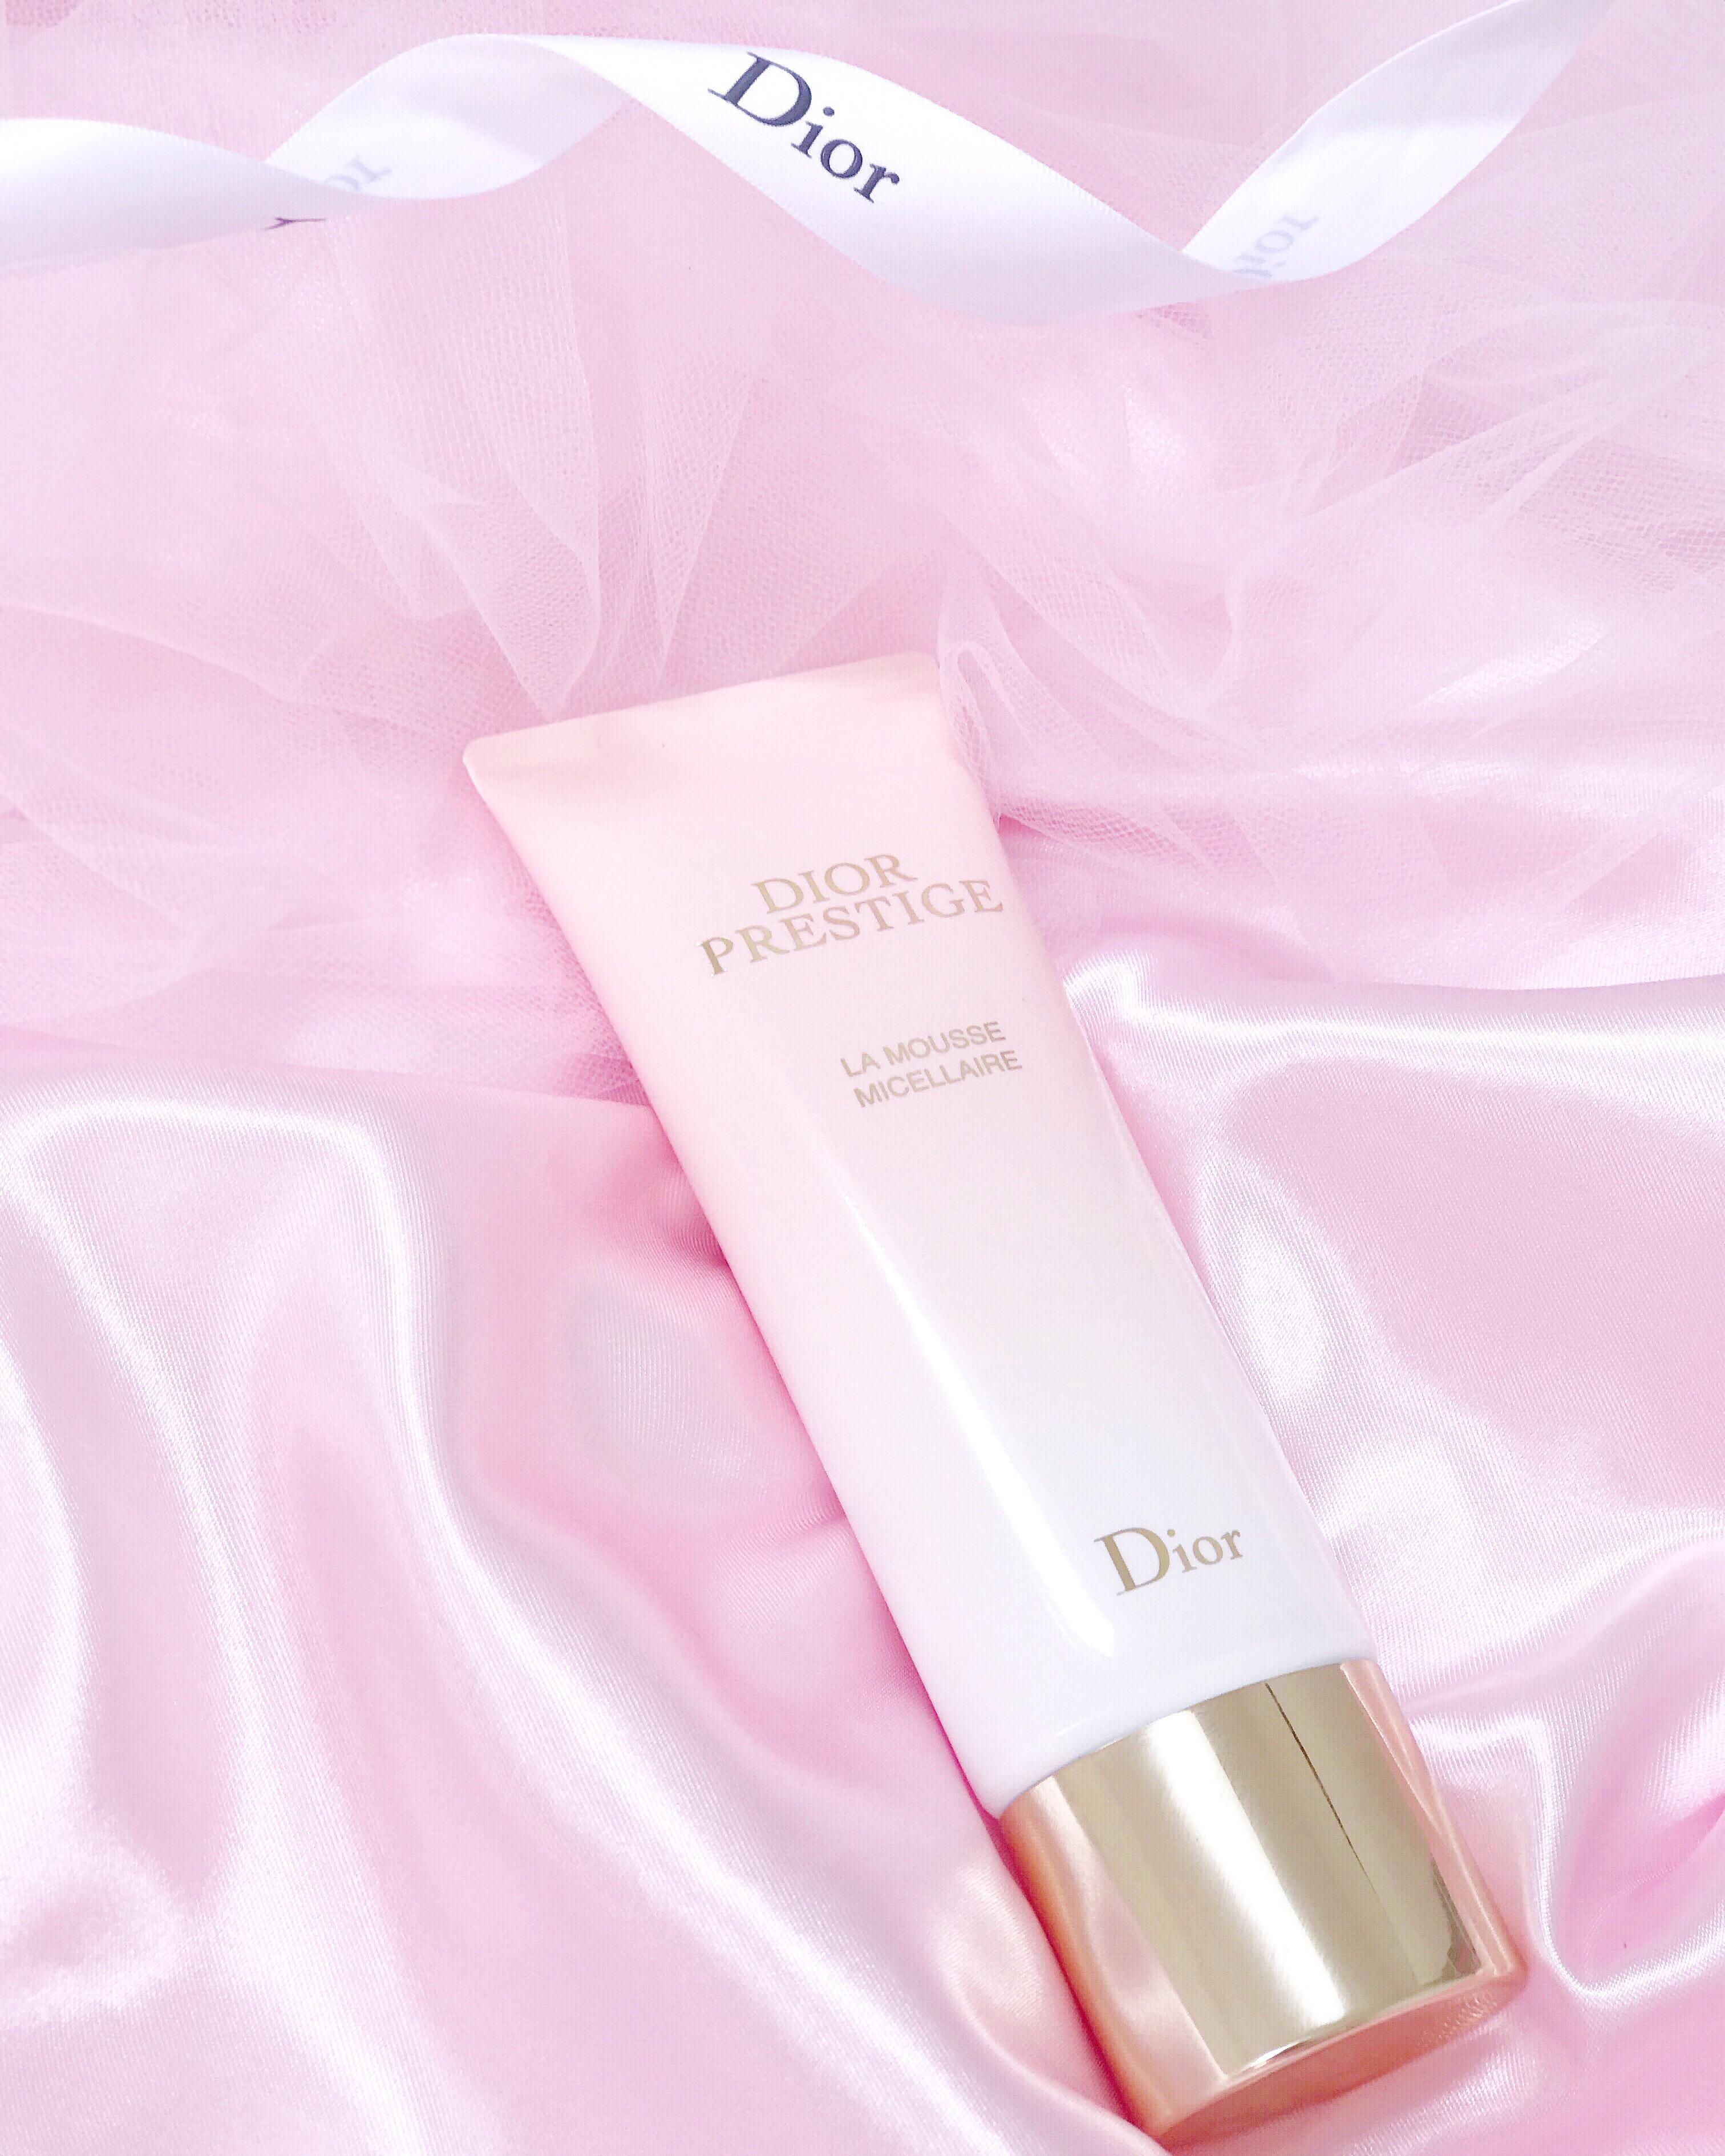 Oh So Heavenly Rose Petal Skin: New Dior Prestige La Mousse